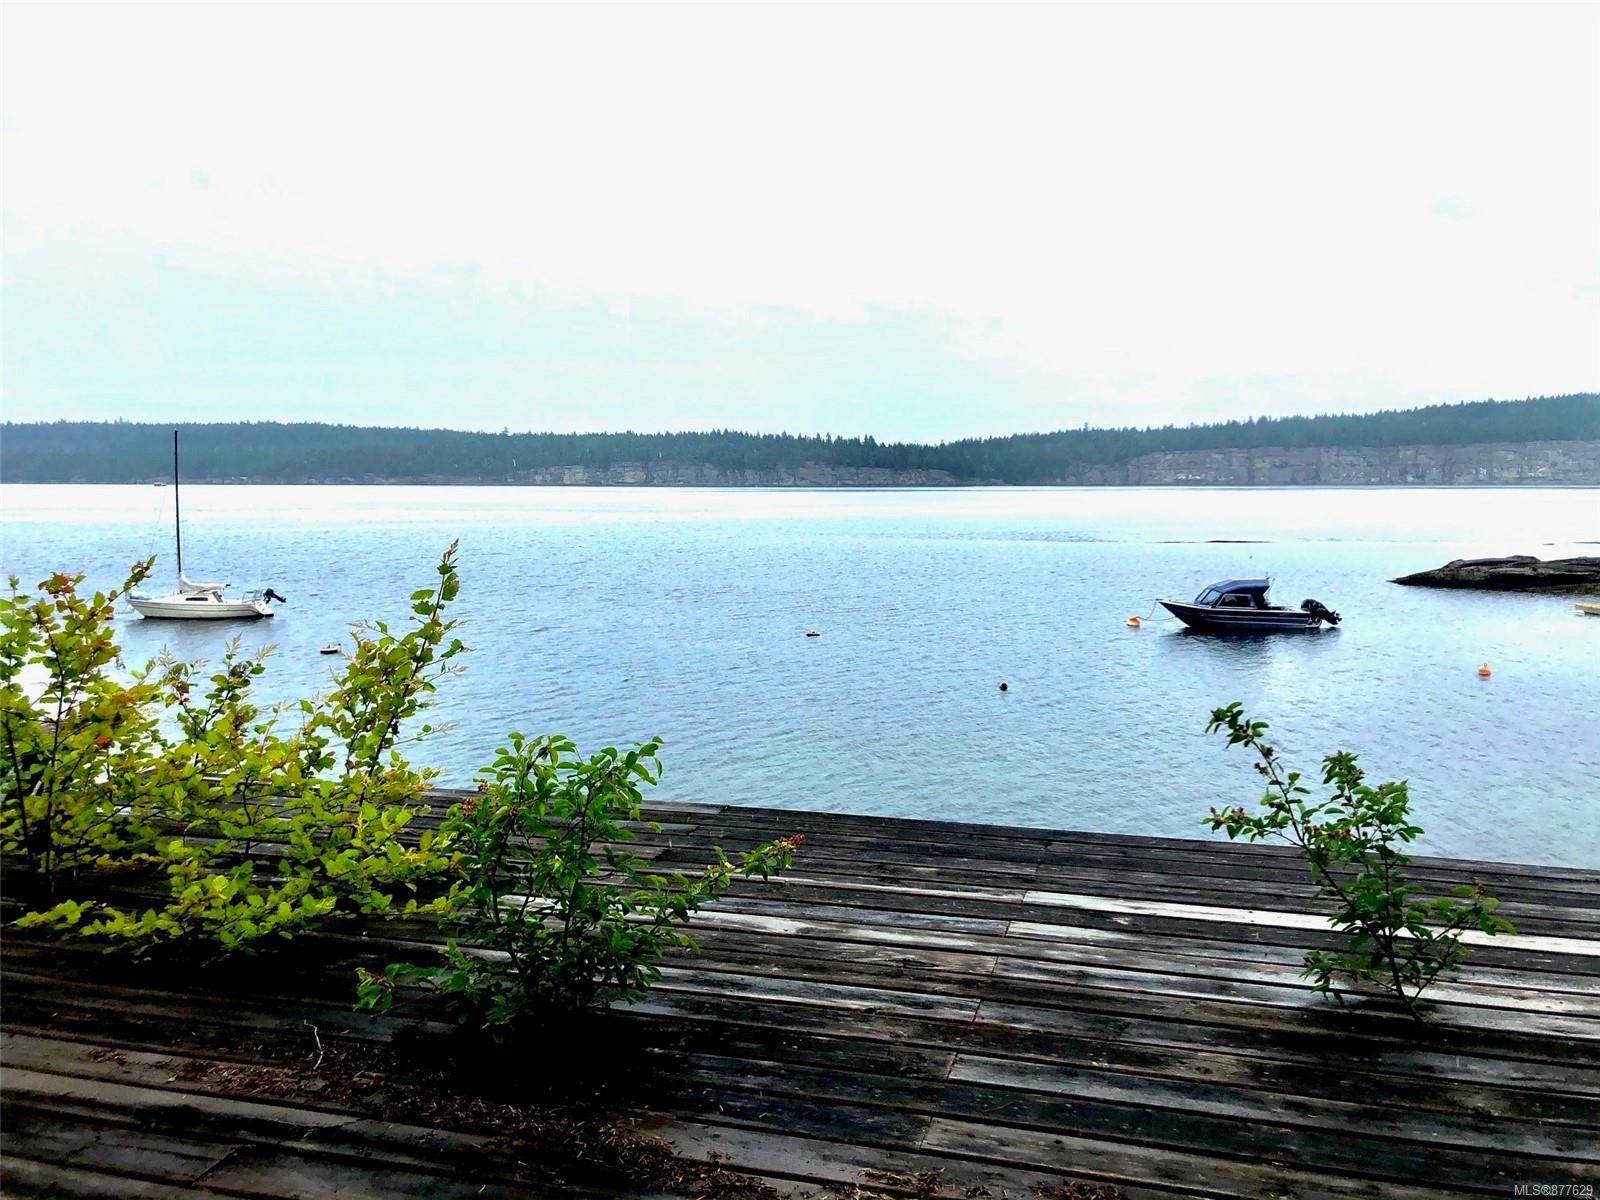 Main Photo: Lt 15 Ruxton (Off) Rd in : Isl Ruxton Island Land for sale (Islands)  : MLS®# 877629